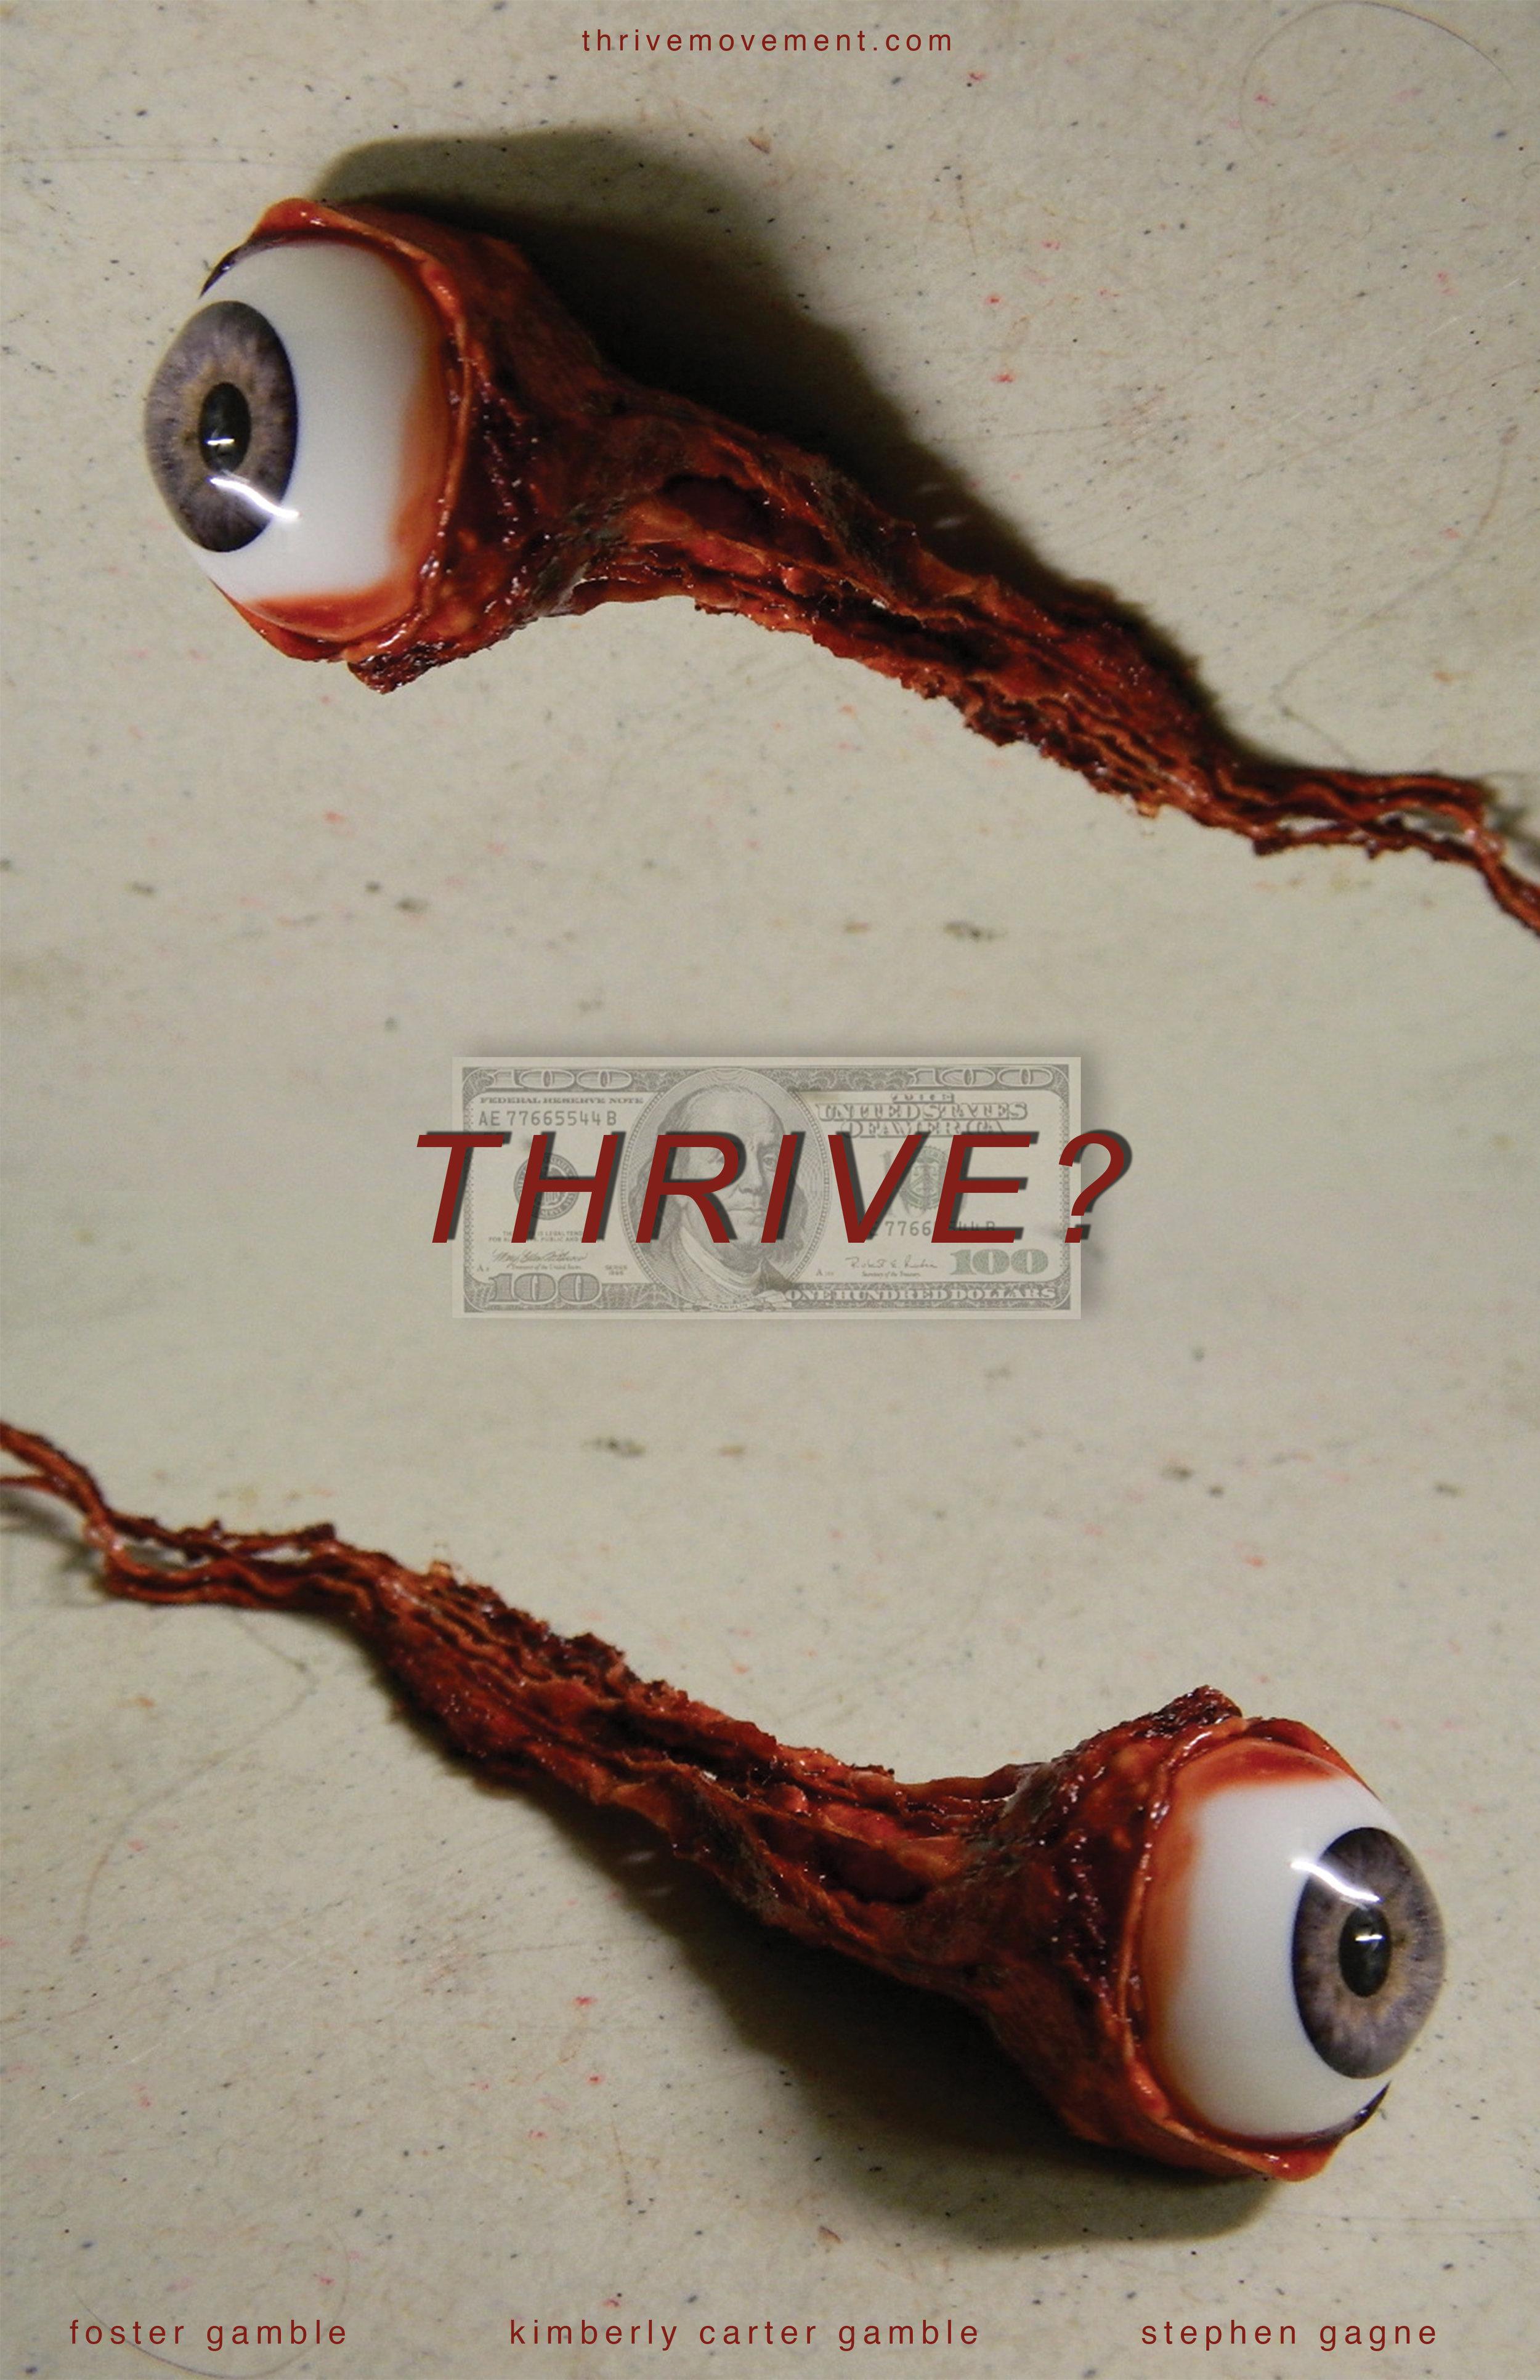 thrive1.jpg